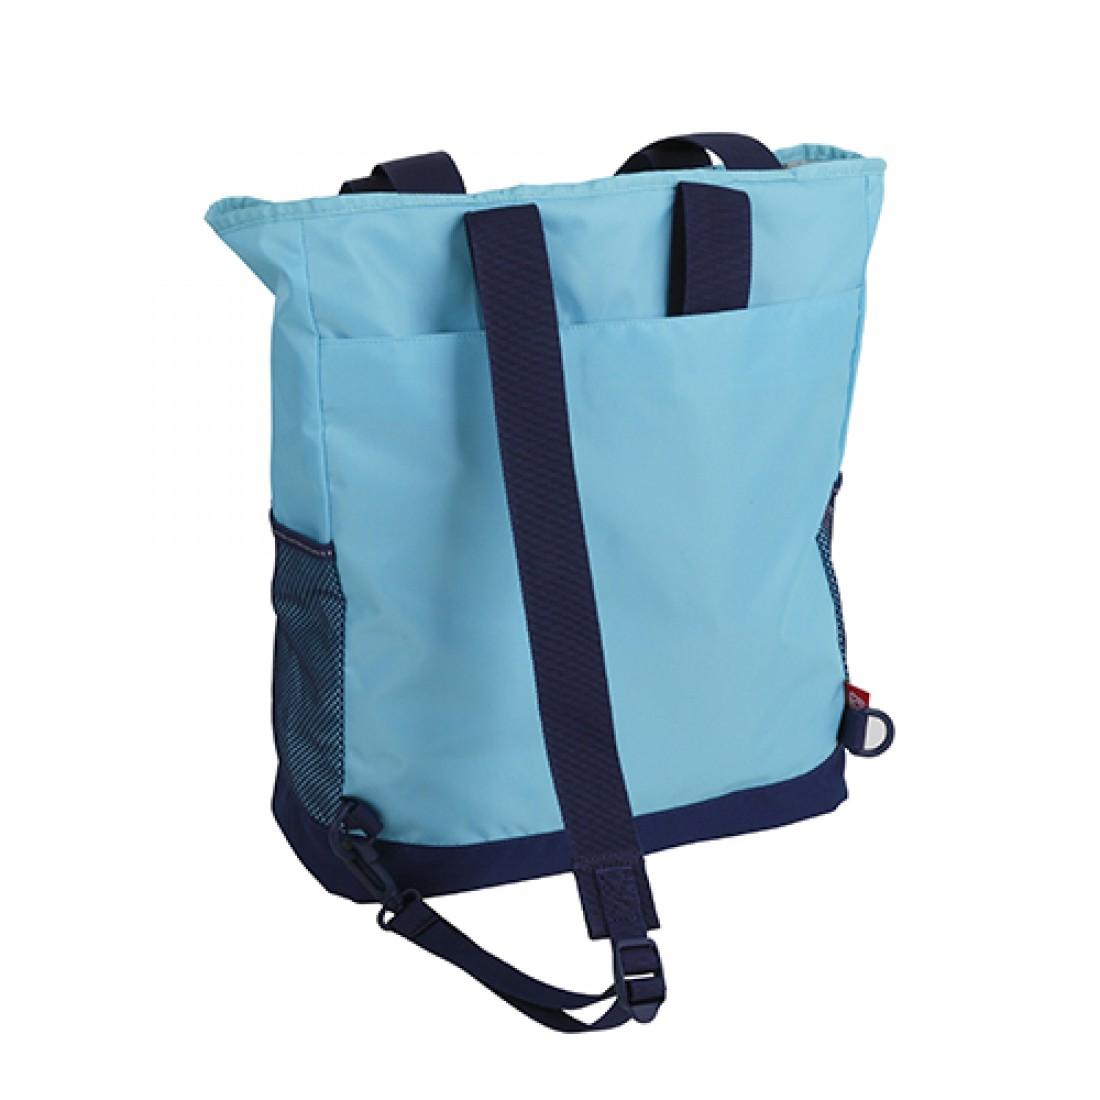 Coleman 2 Way Tote Backpack Desert Sand